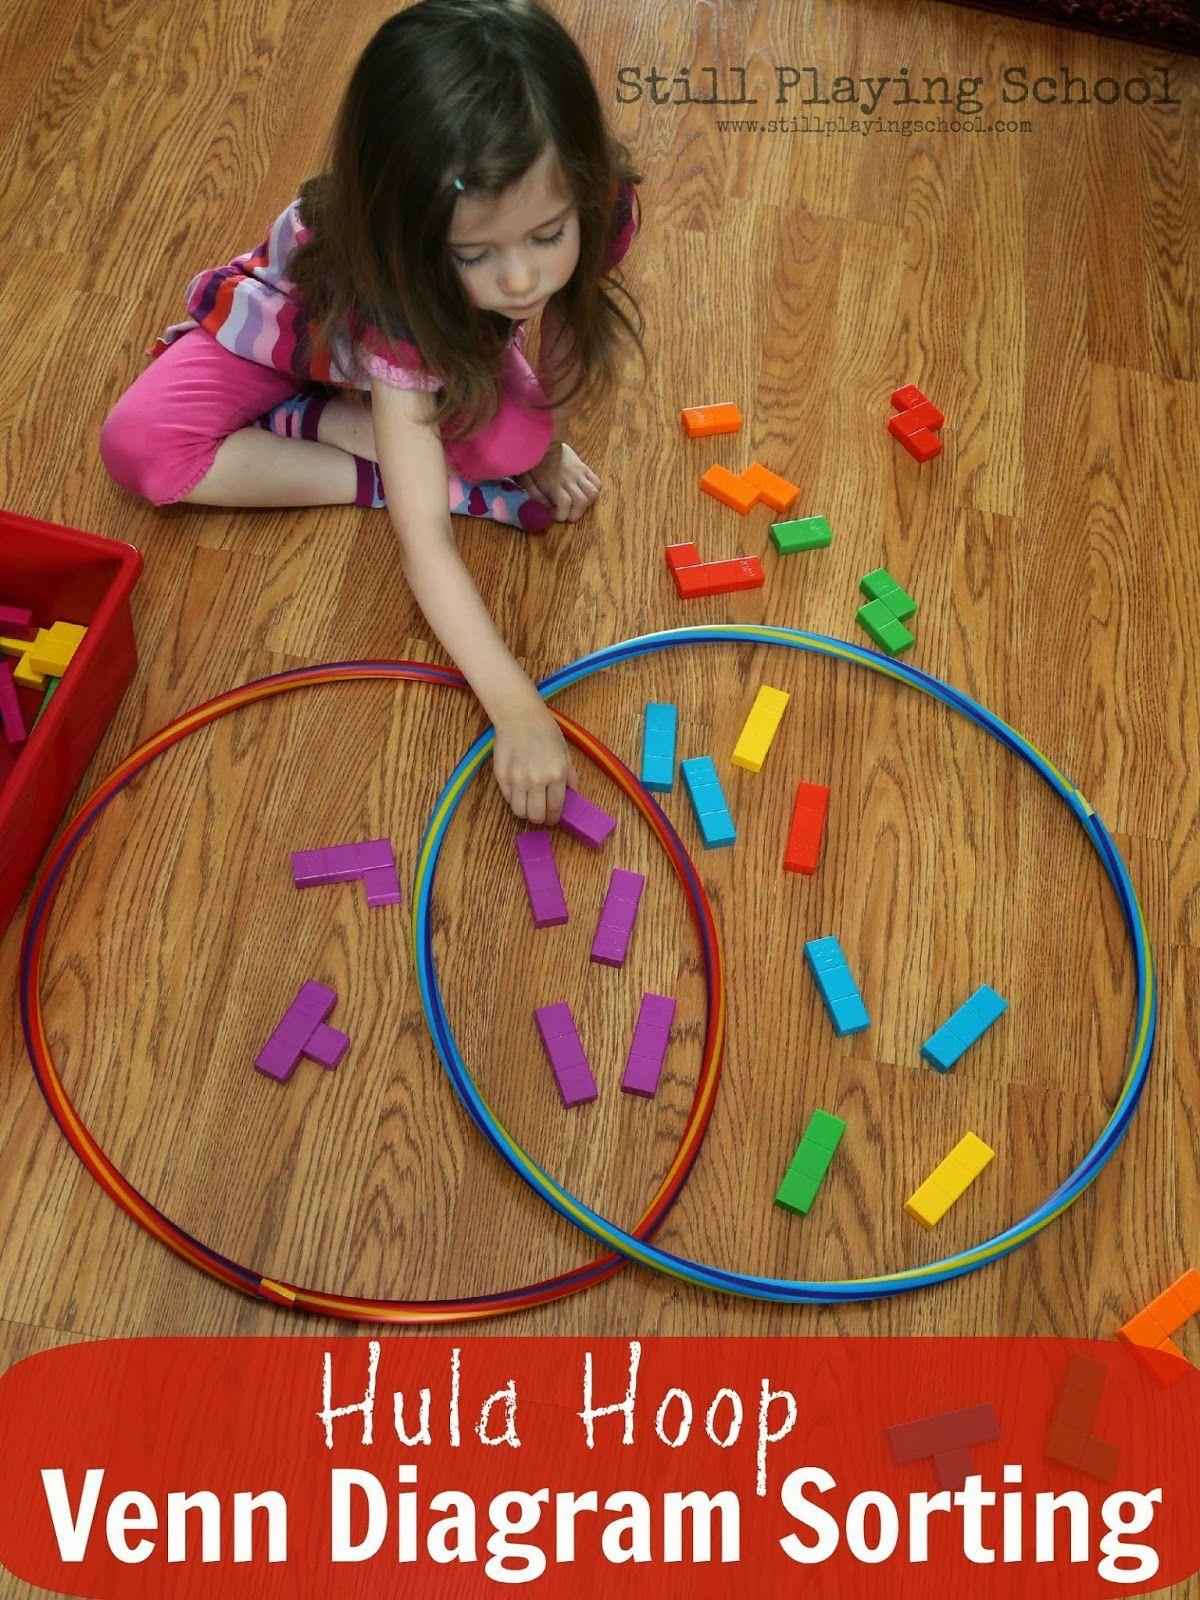 medium resolution of hula hoop venn diagram sorting venn diagrams math classroom kindergarten math classroom ideas